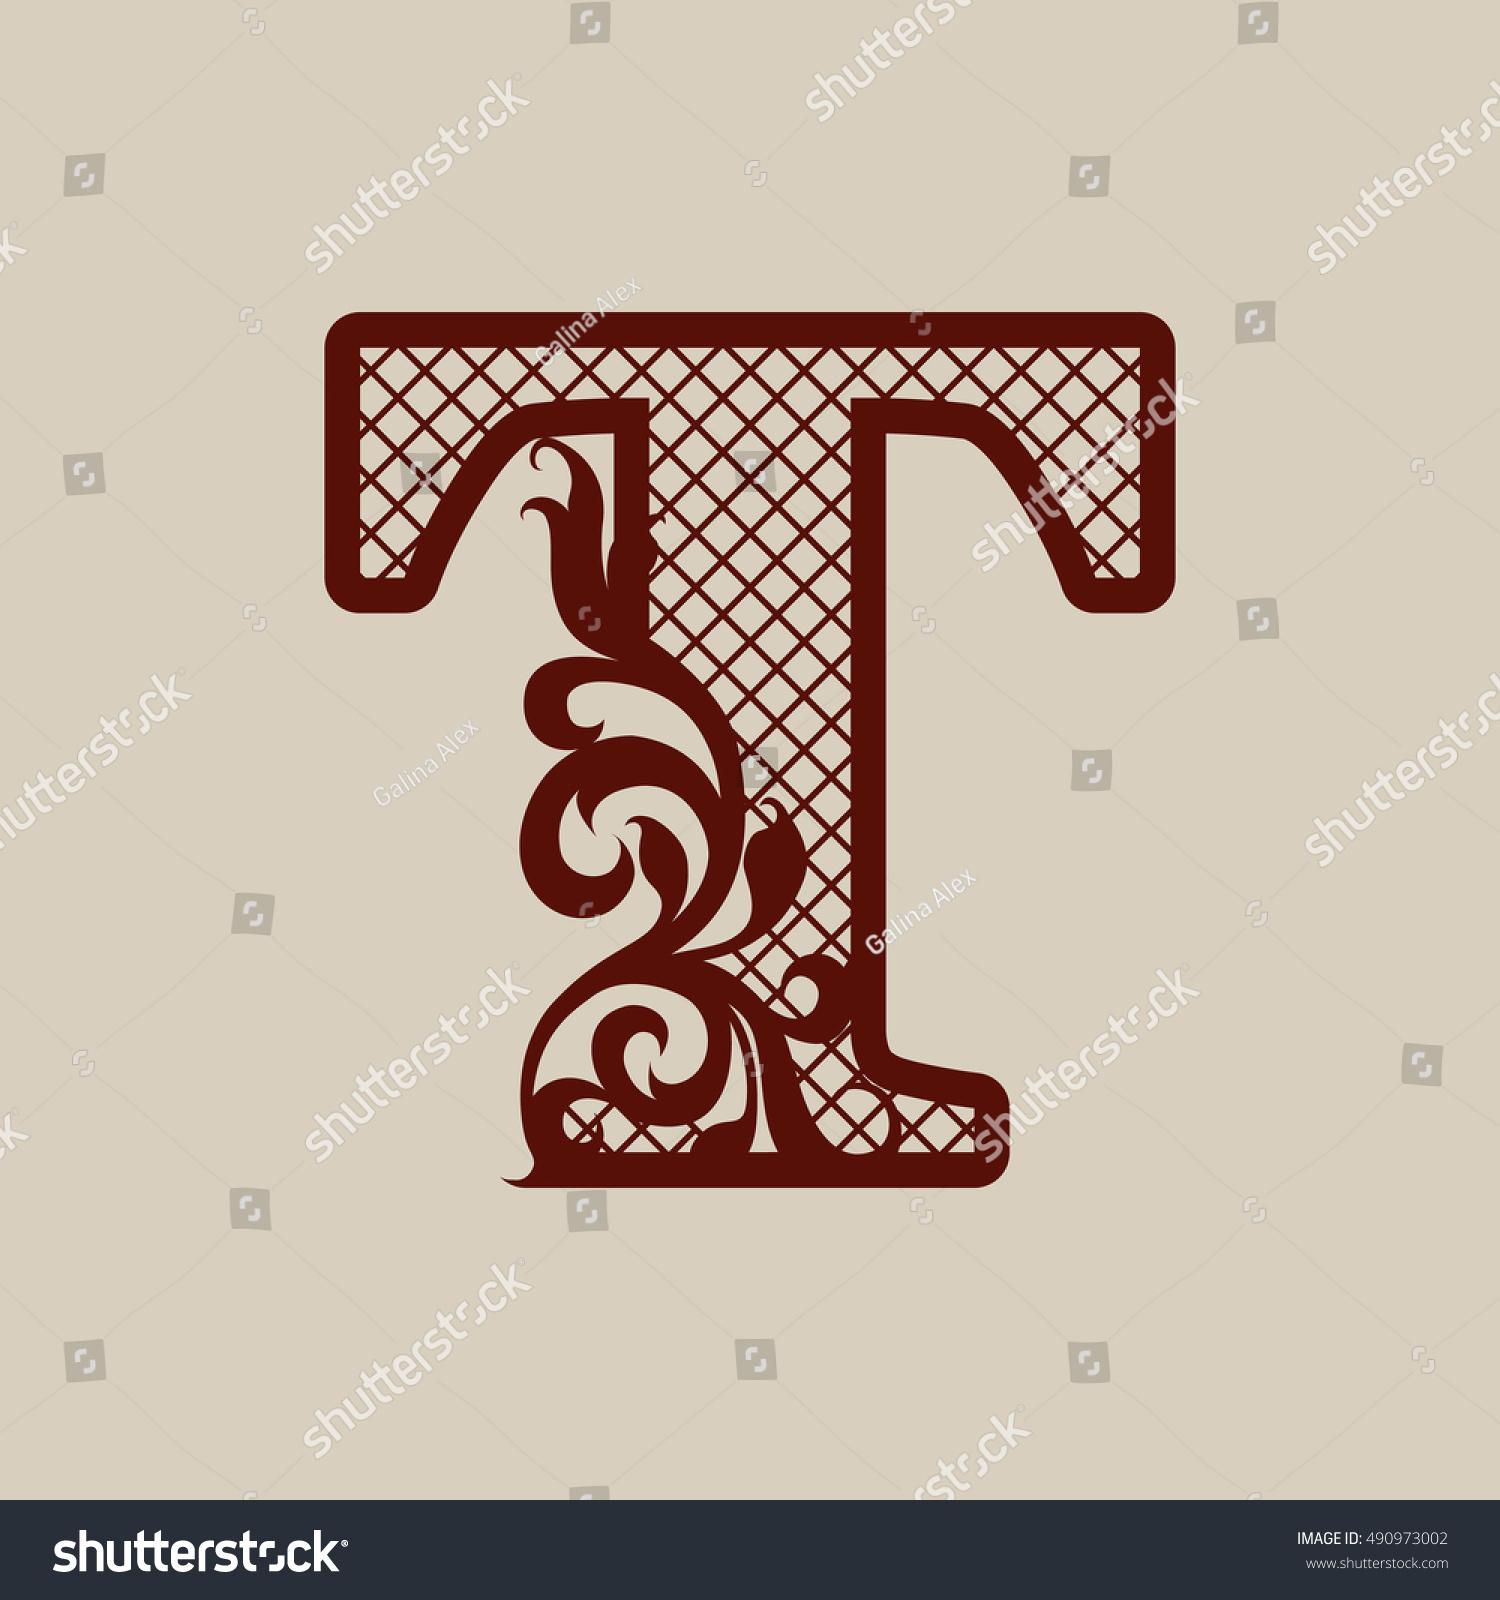 Elegant Monogram Letter T Carved Openwork Stock Vector (Royalty Free ...